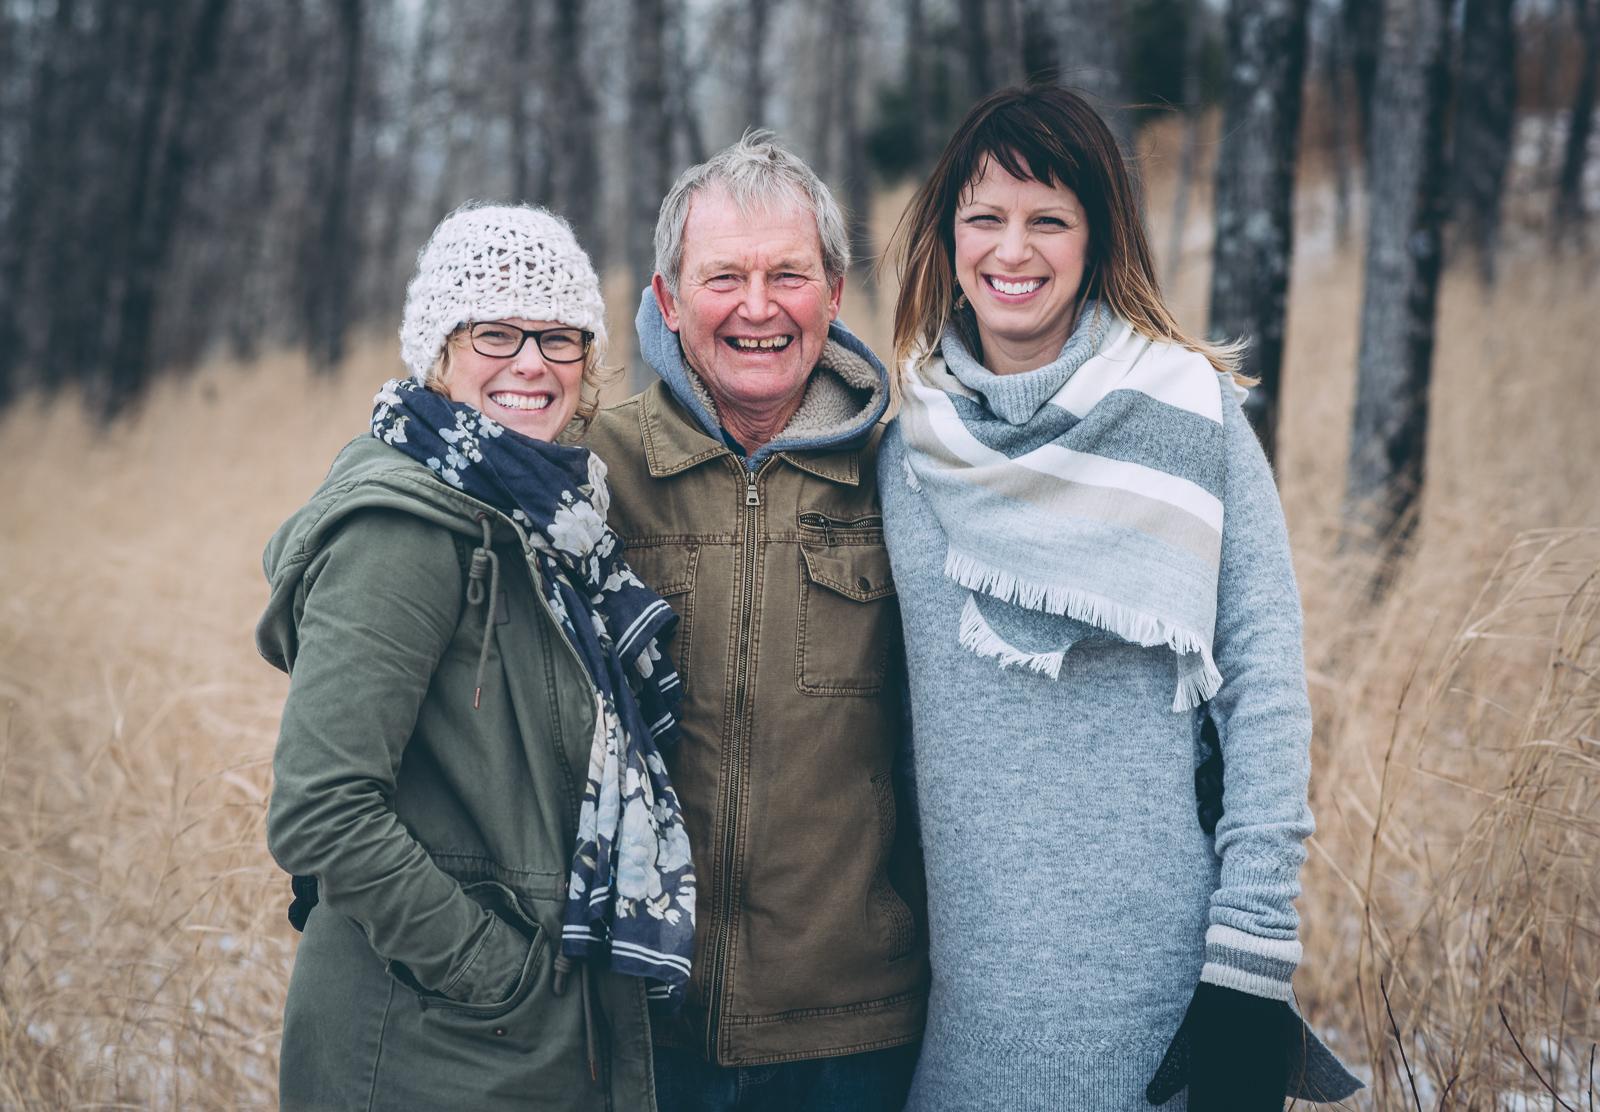 heather-family-portraits-120218-blog-15.jpg